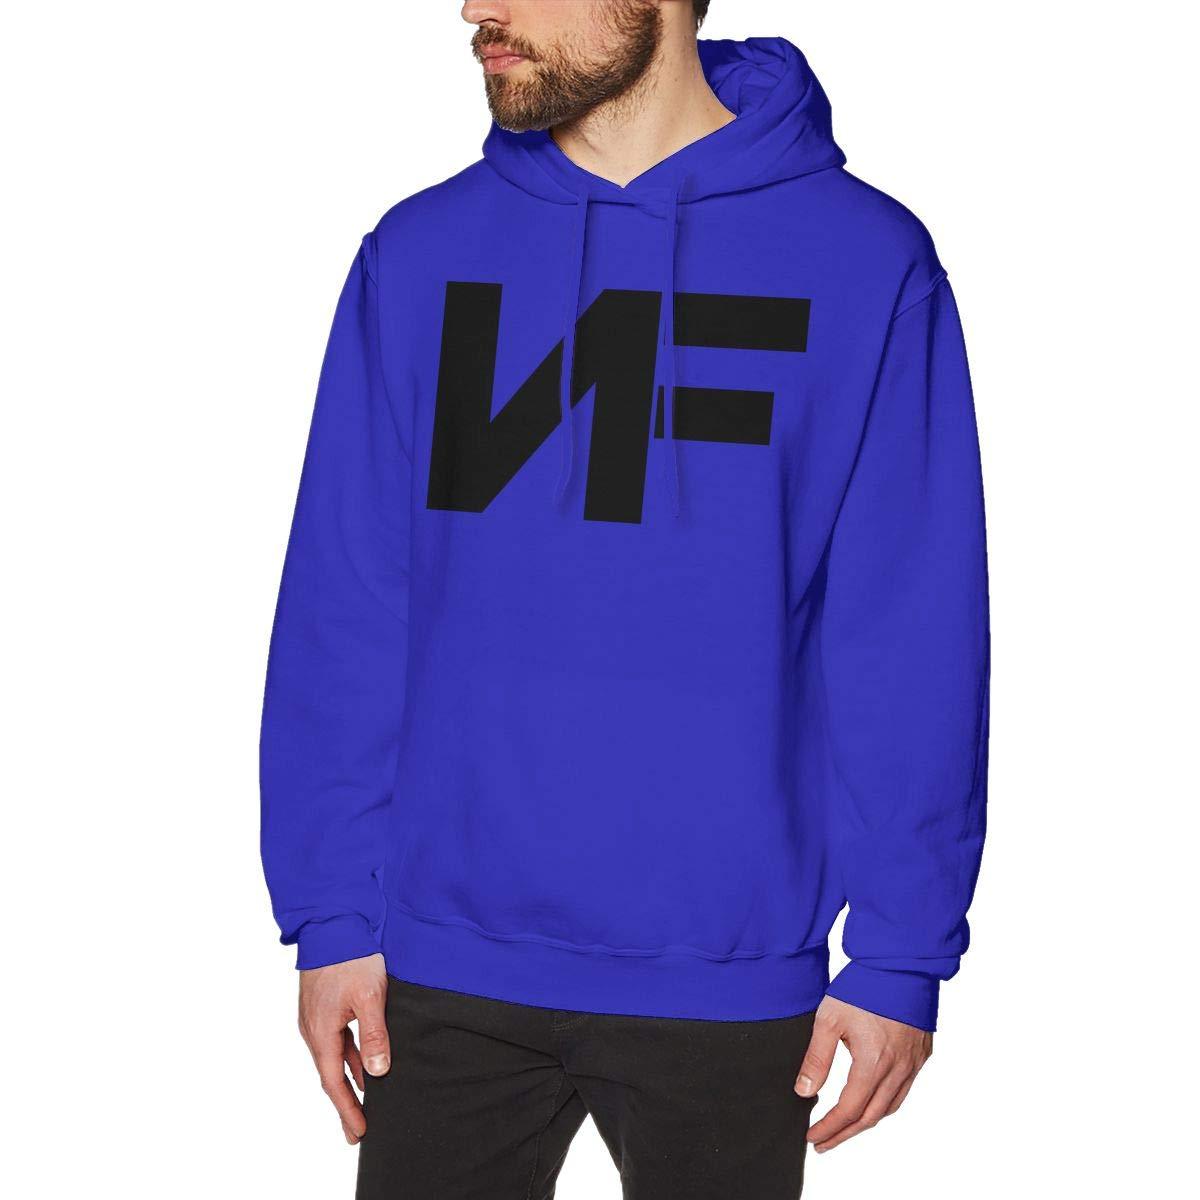 Men's NF Rapper Logo-Logo Hoodie Custom Pullover Sweatshirt Long Sleeve Hoodies Hooded for Youth Boys Men Blue 2XL by Cxcai